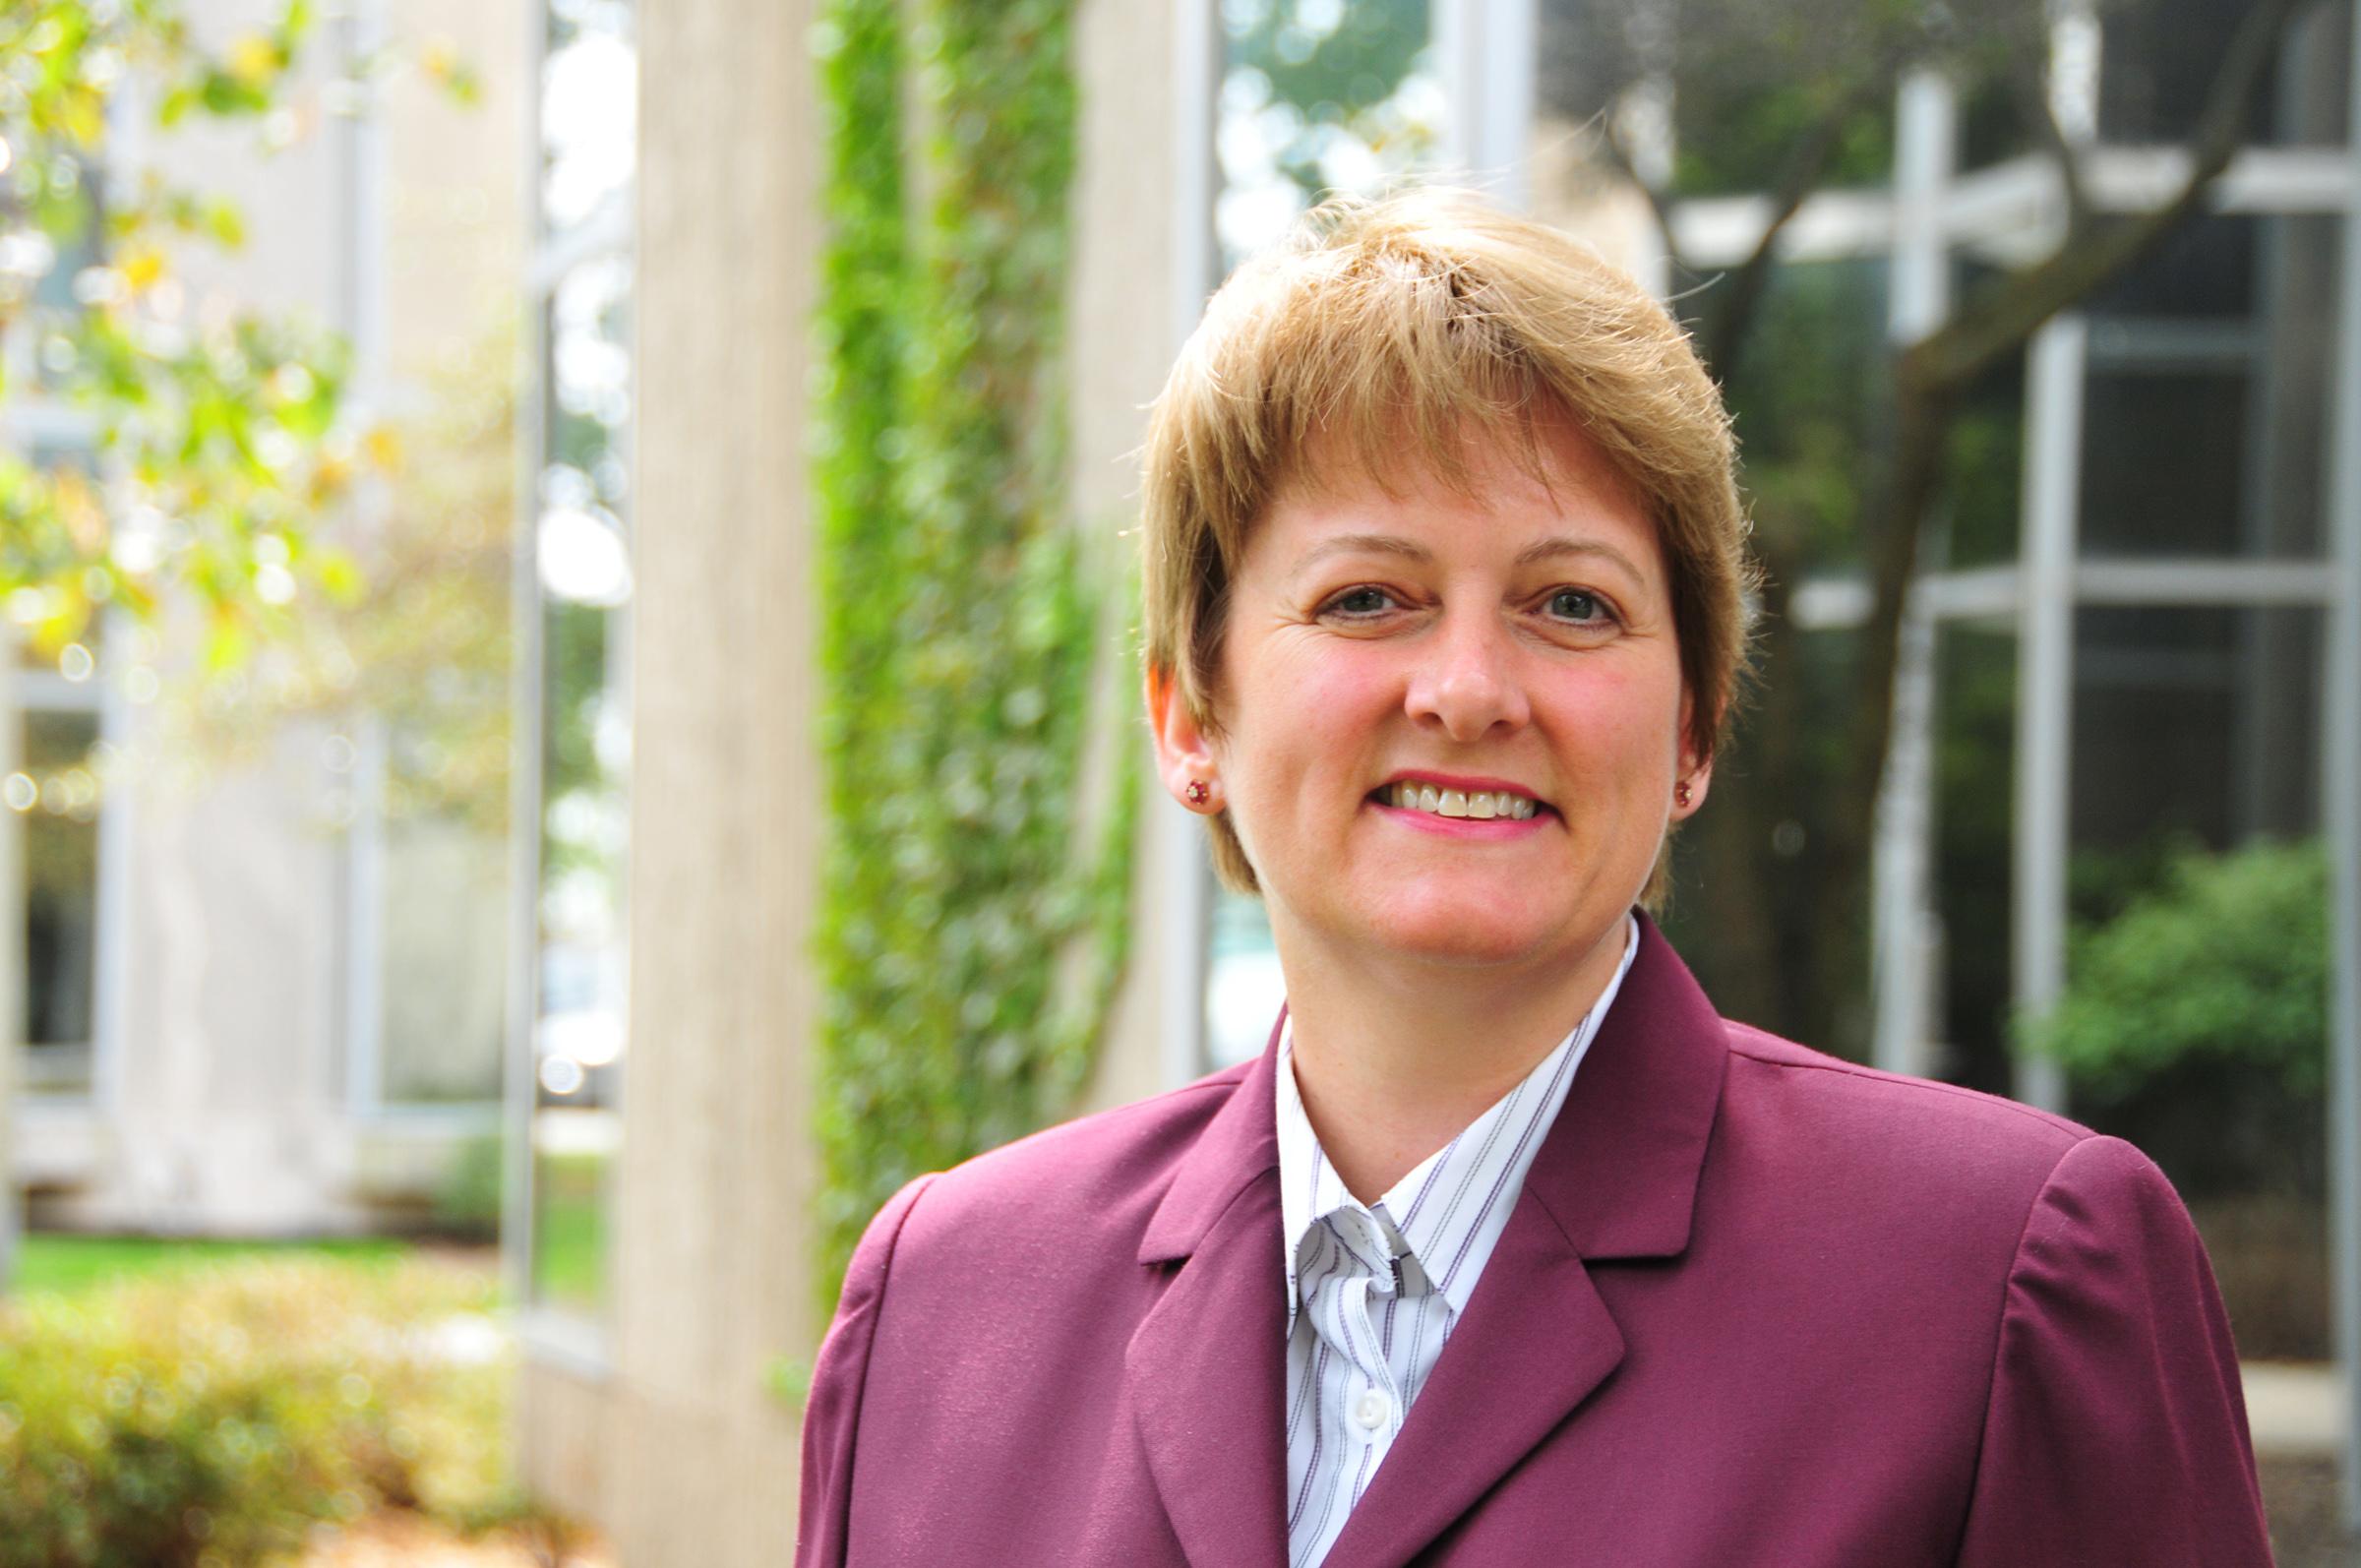 Angela G. Ray, associate professor of Communication Studies at Northwestern University.